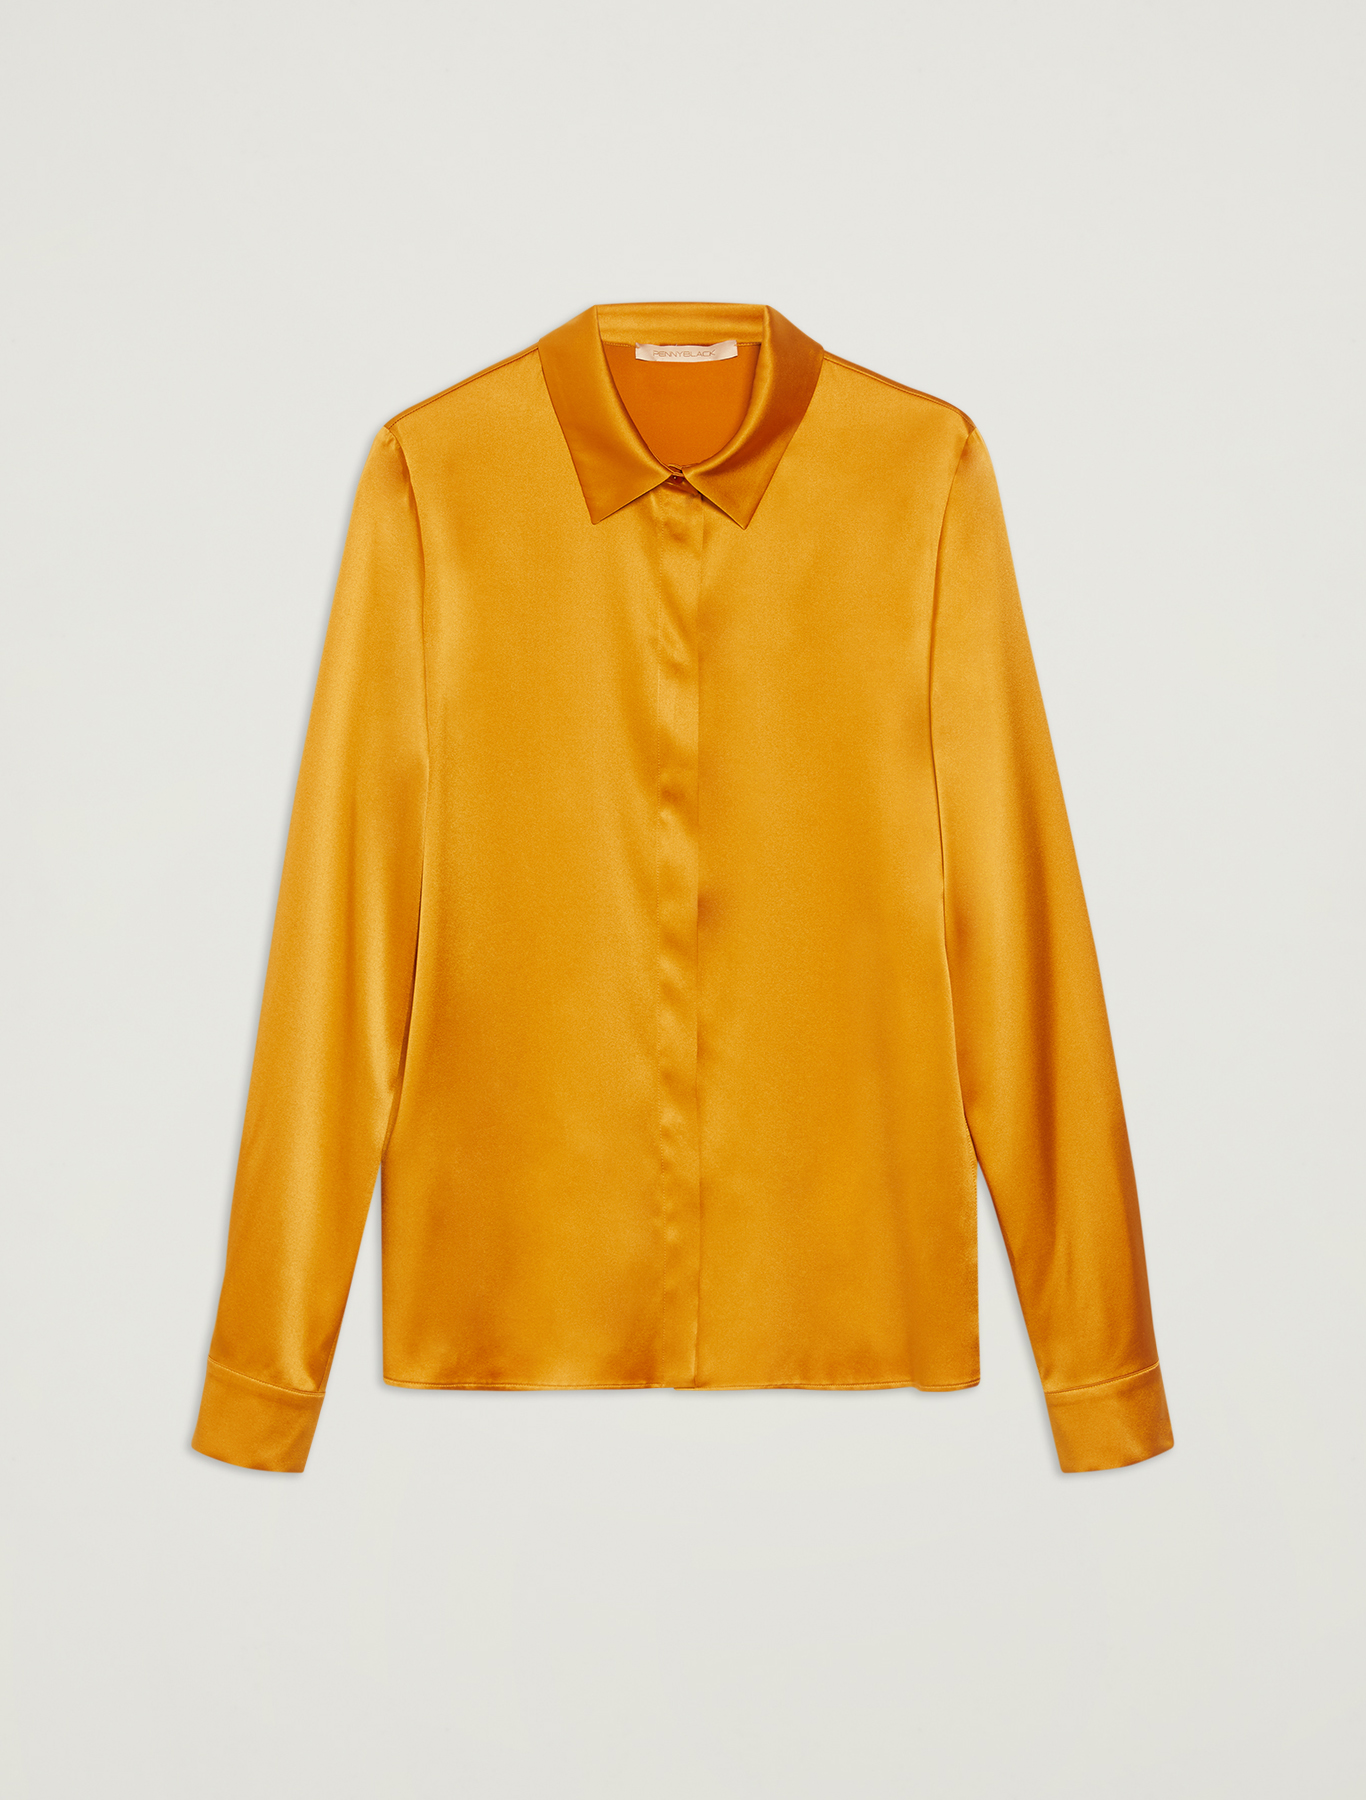 Silk satin shirt - mustard - pennyblack